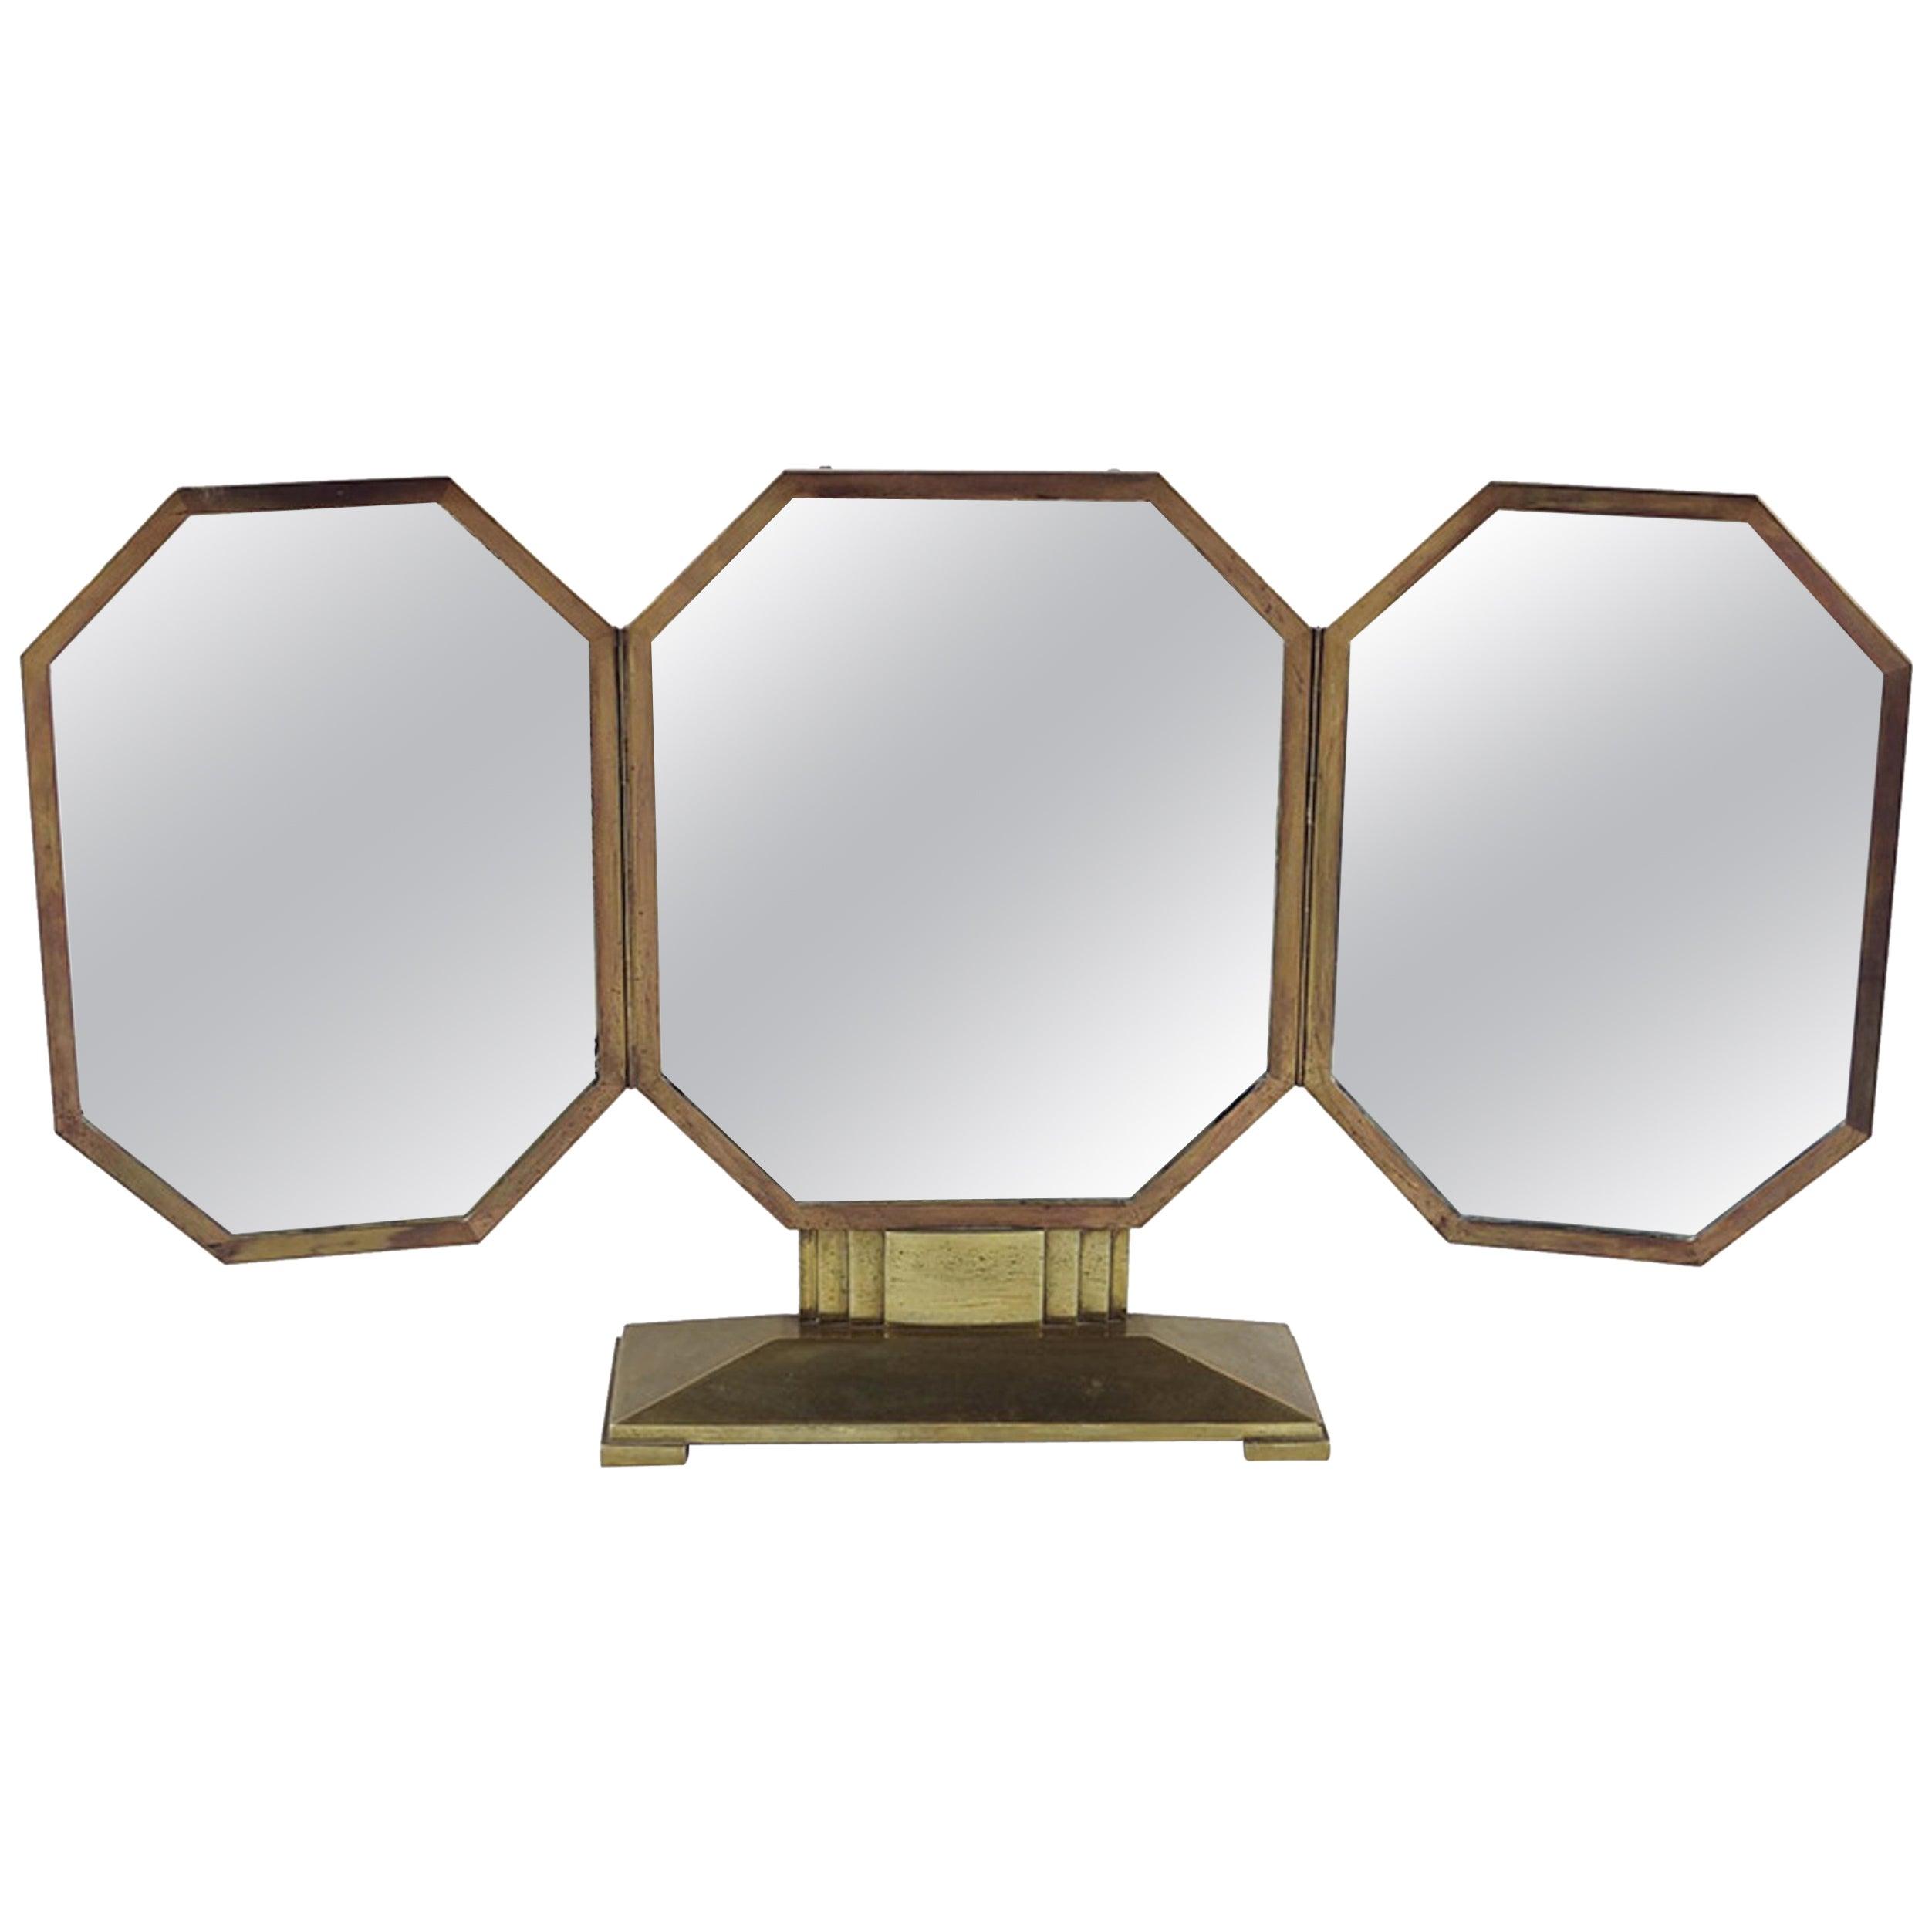 French Art Deco Bronze Vanity Mirror, Original Mirrors, Great Scale